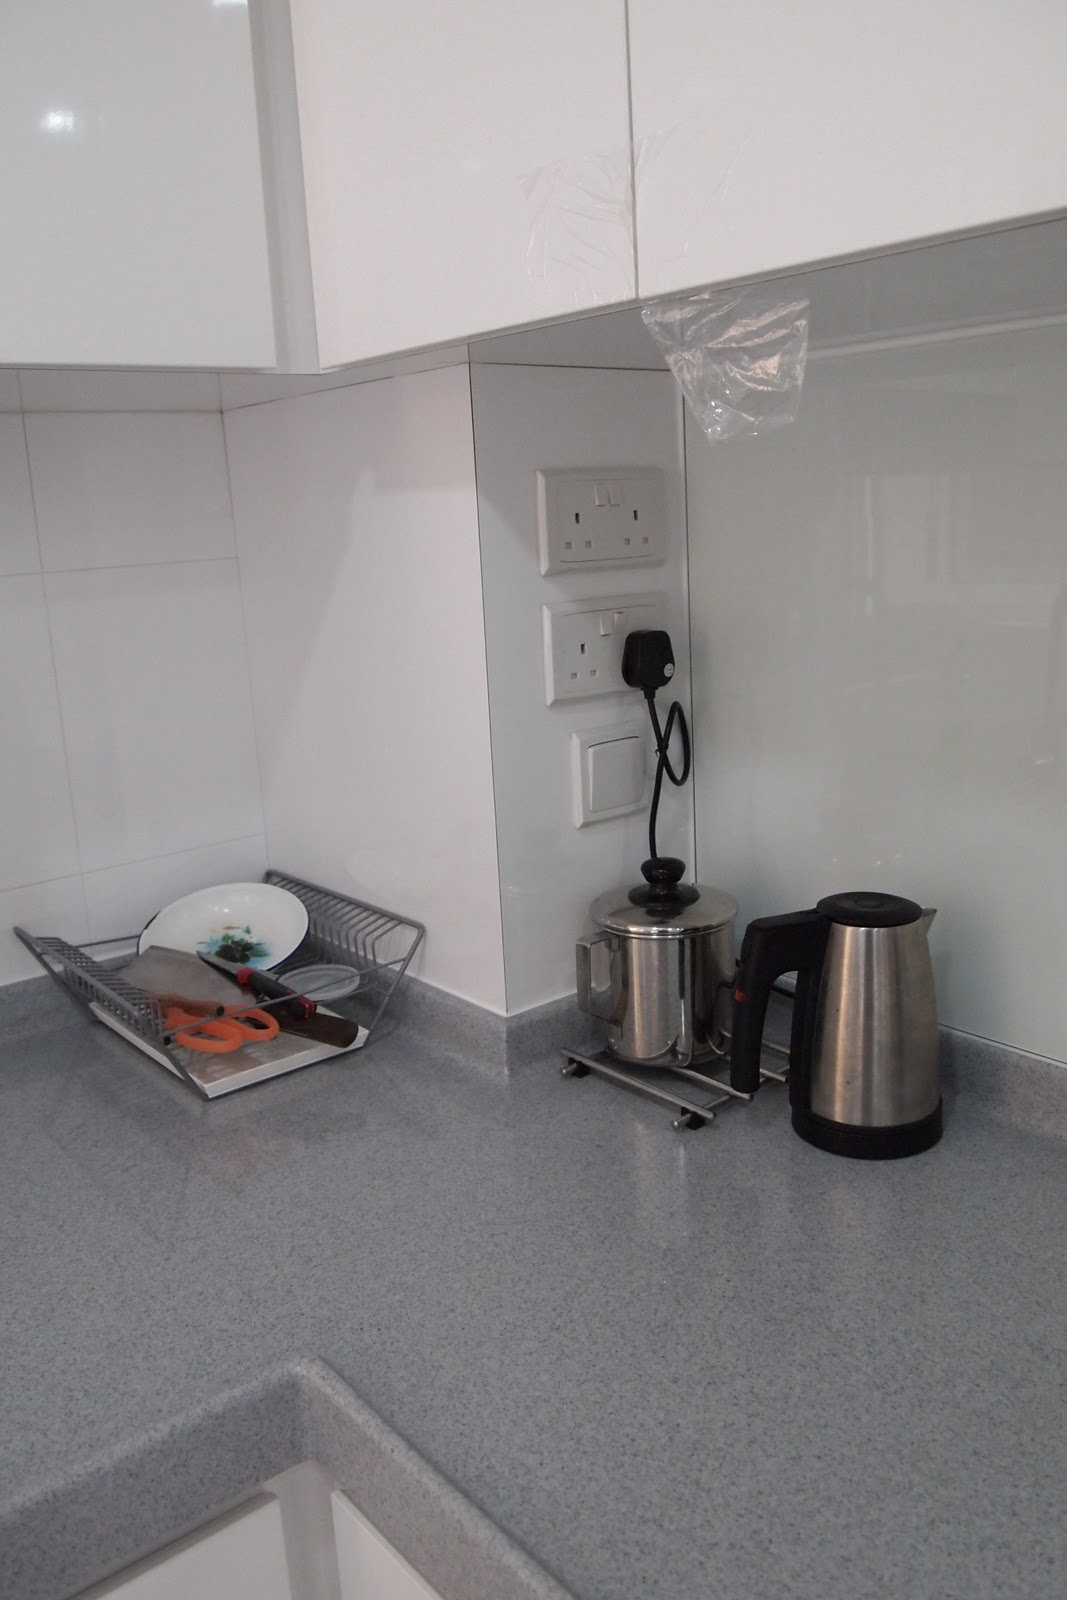 Refurbish Kitchen Cabinet Singapore